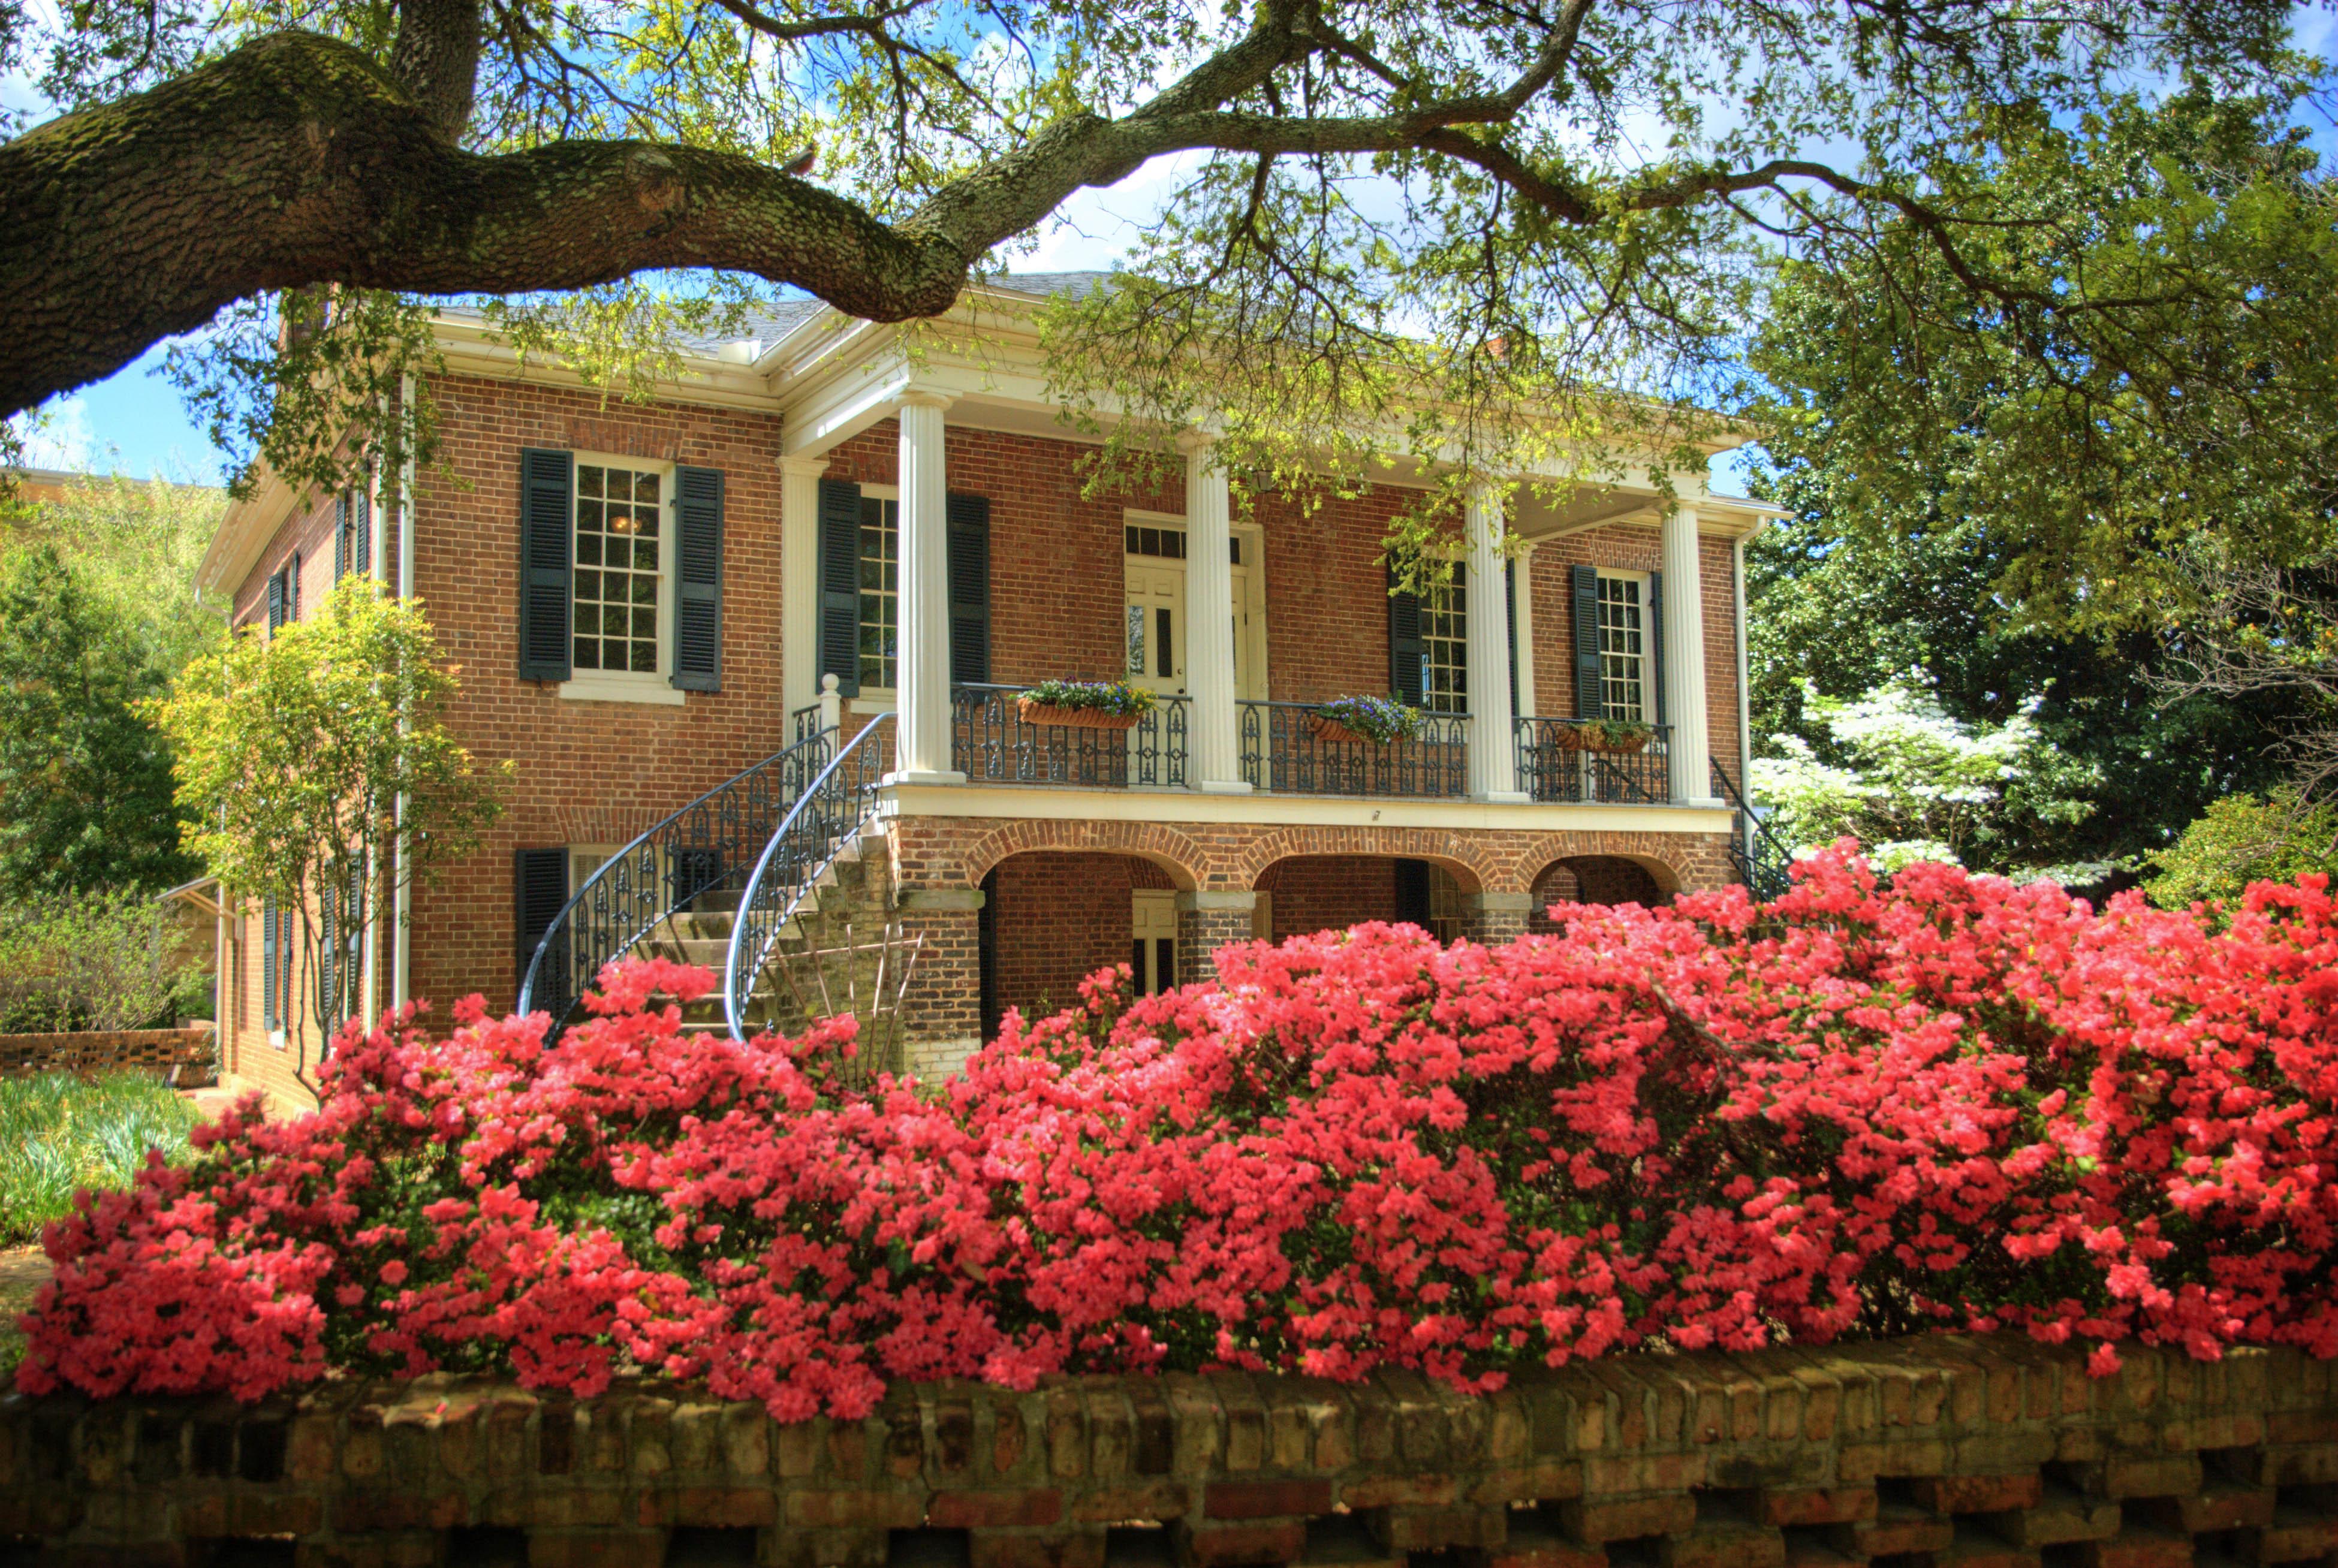 Alabama: Alabama Tourism Department Set To Release Next Round Of